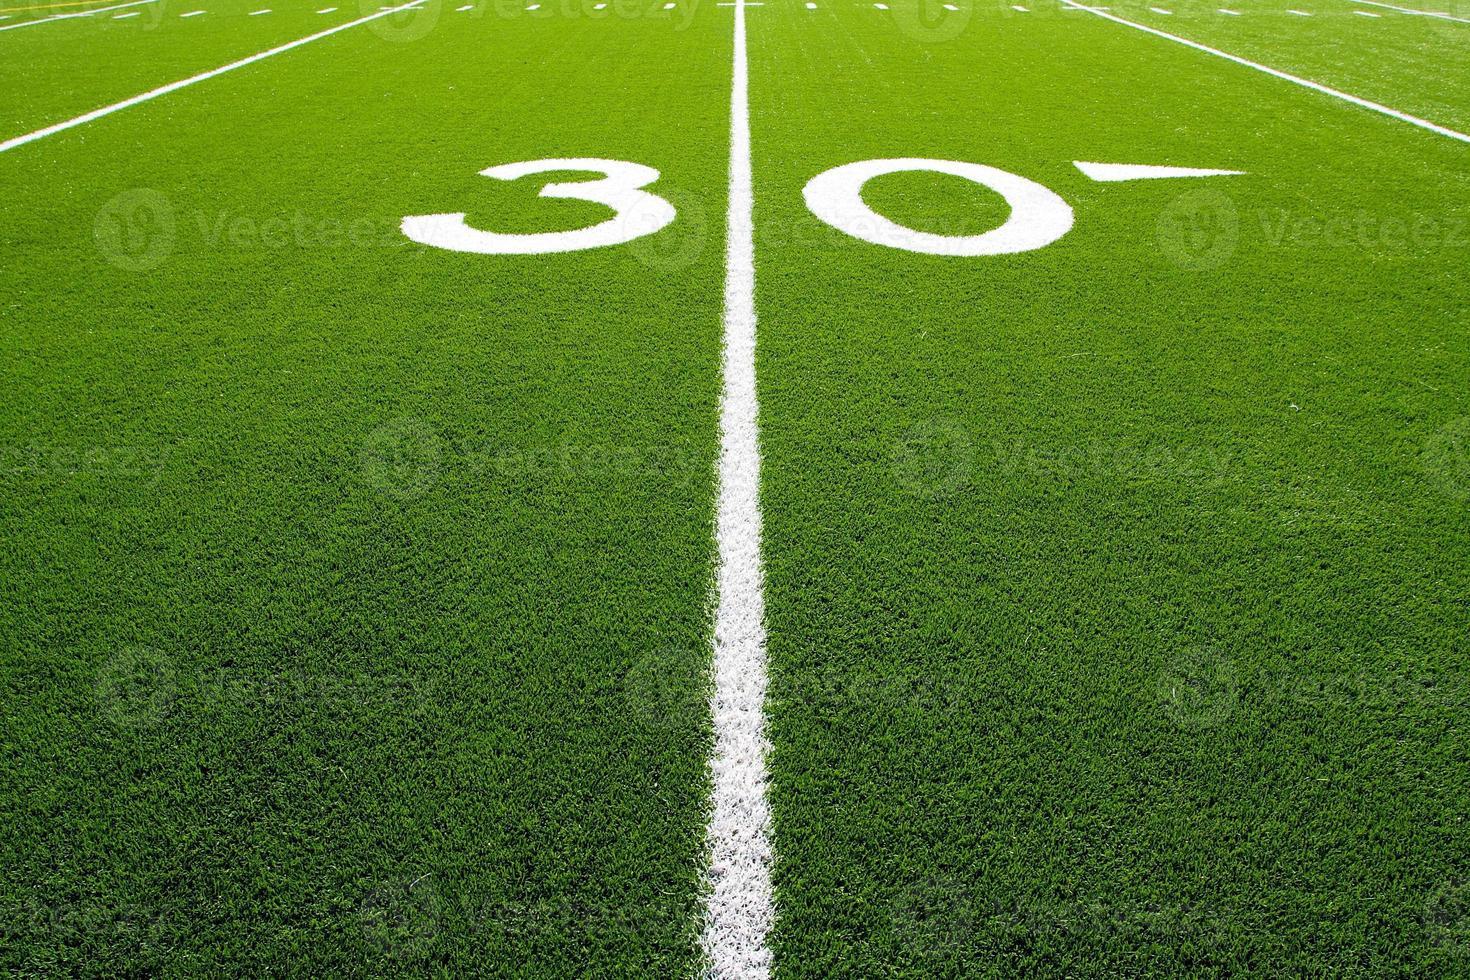 Amerikaanse voetbalveld dertig yard lijn foto